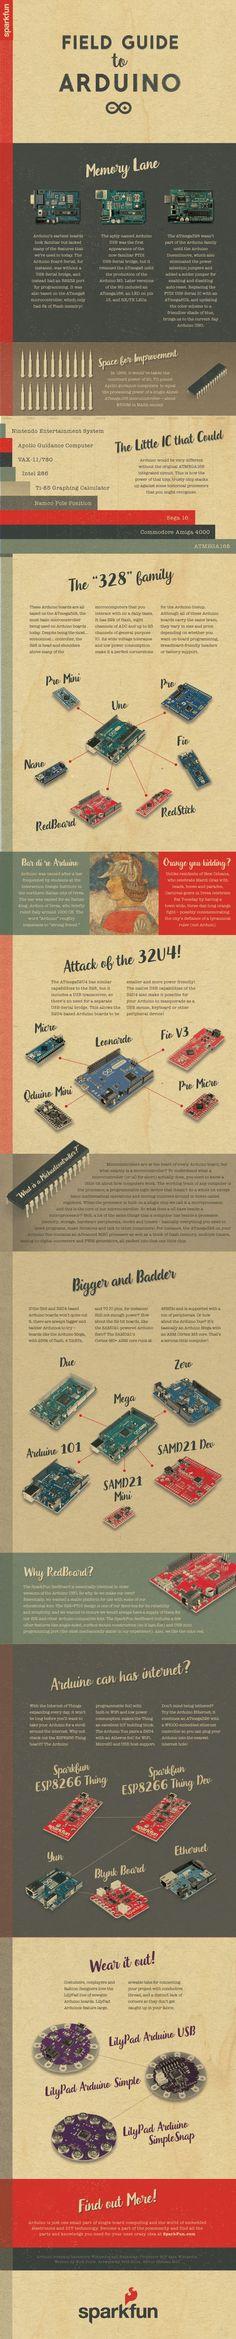 Field guide to arduino sparkfun